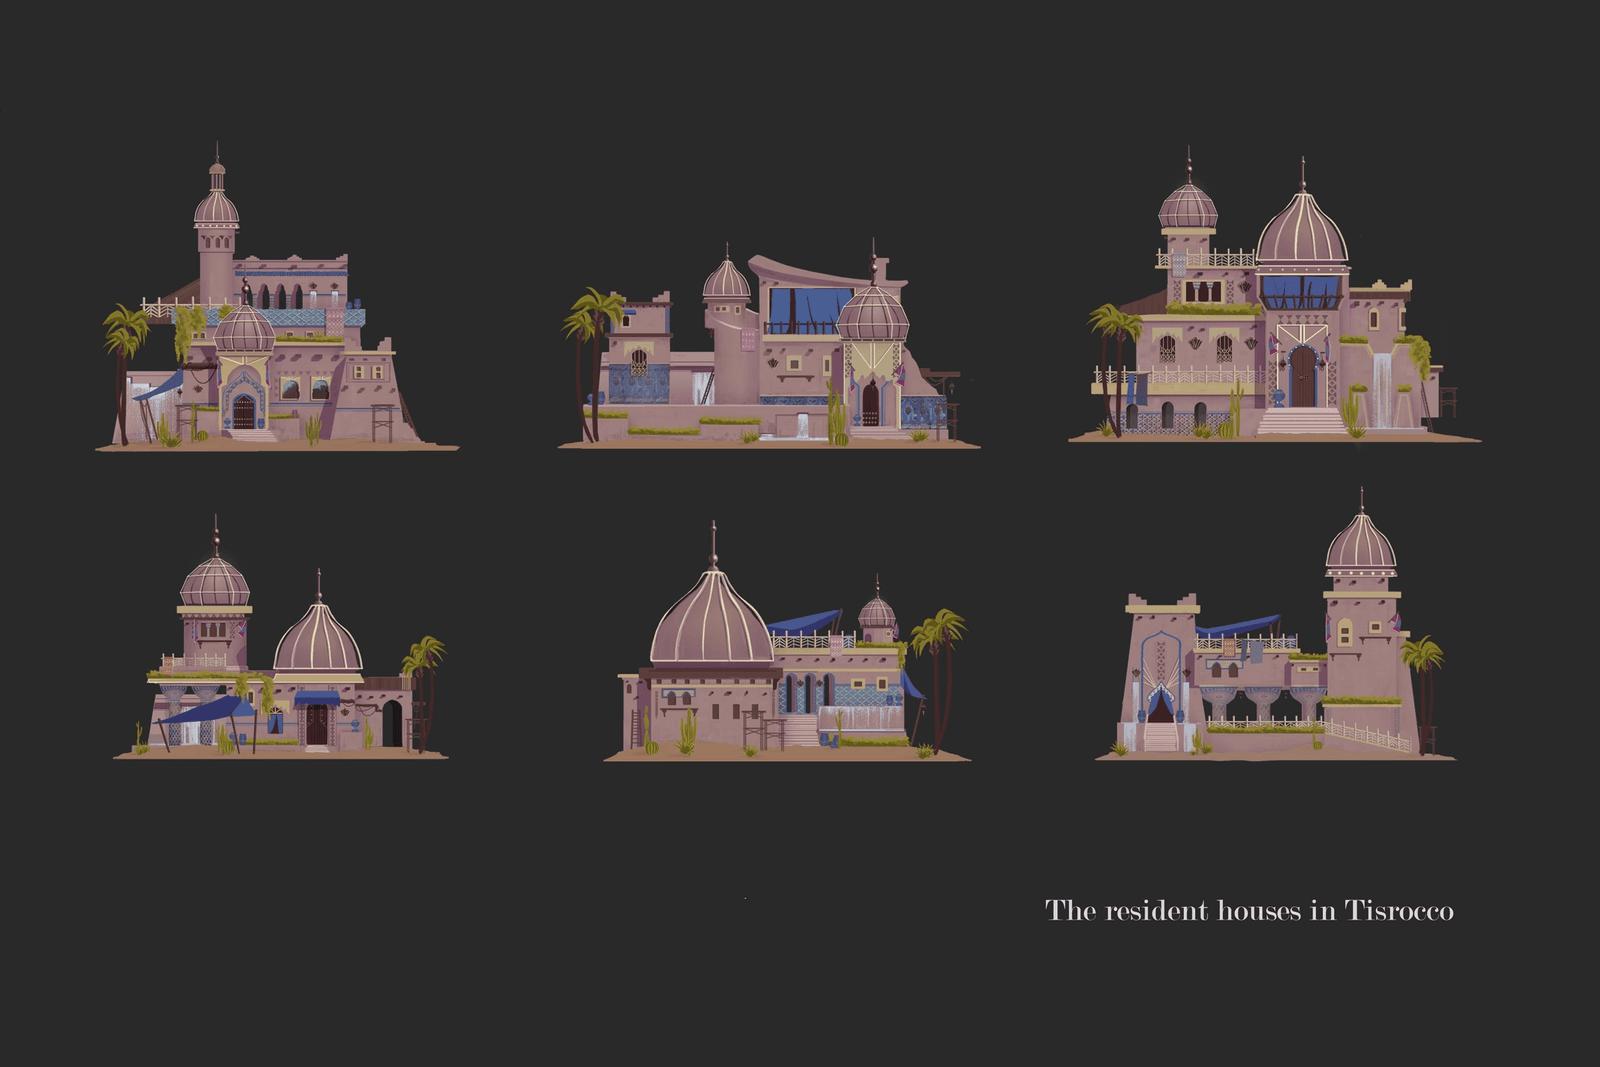 Tisrocco Resident Houses